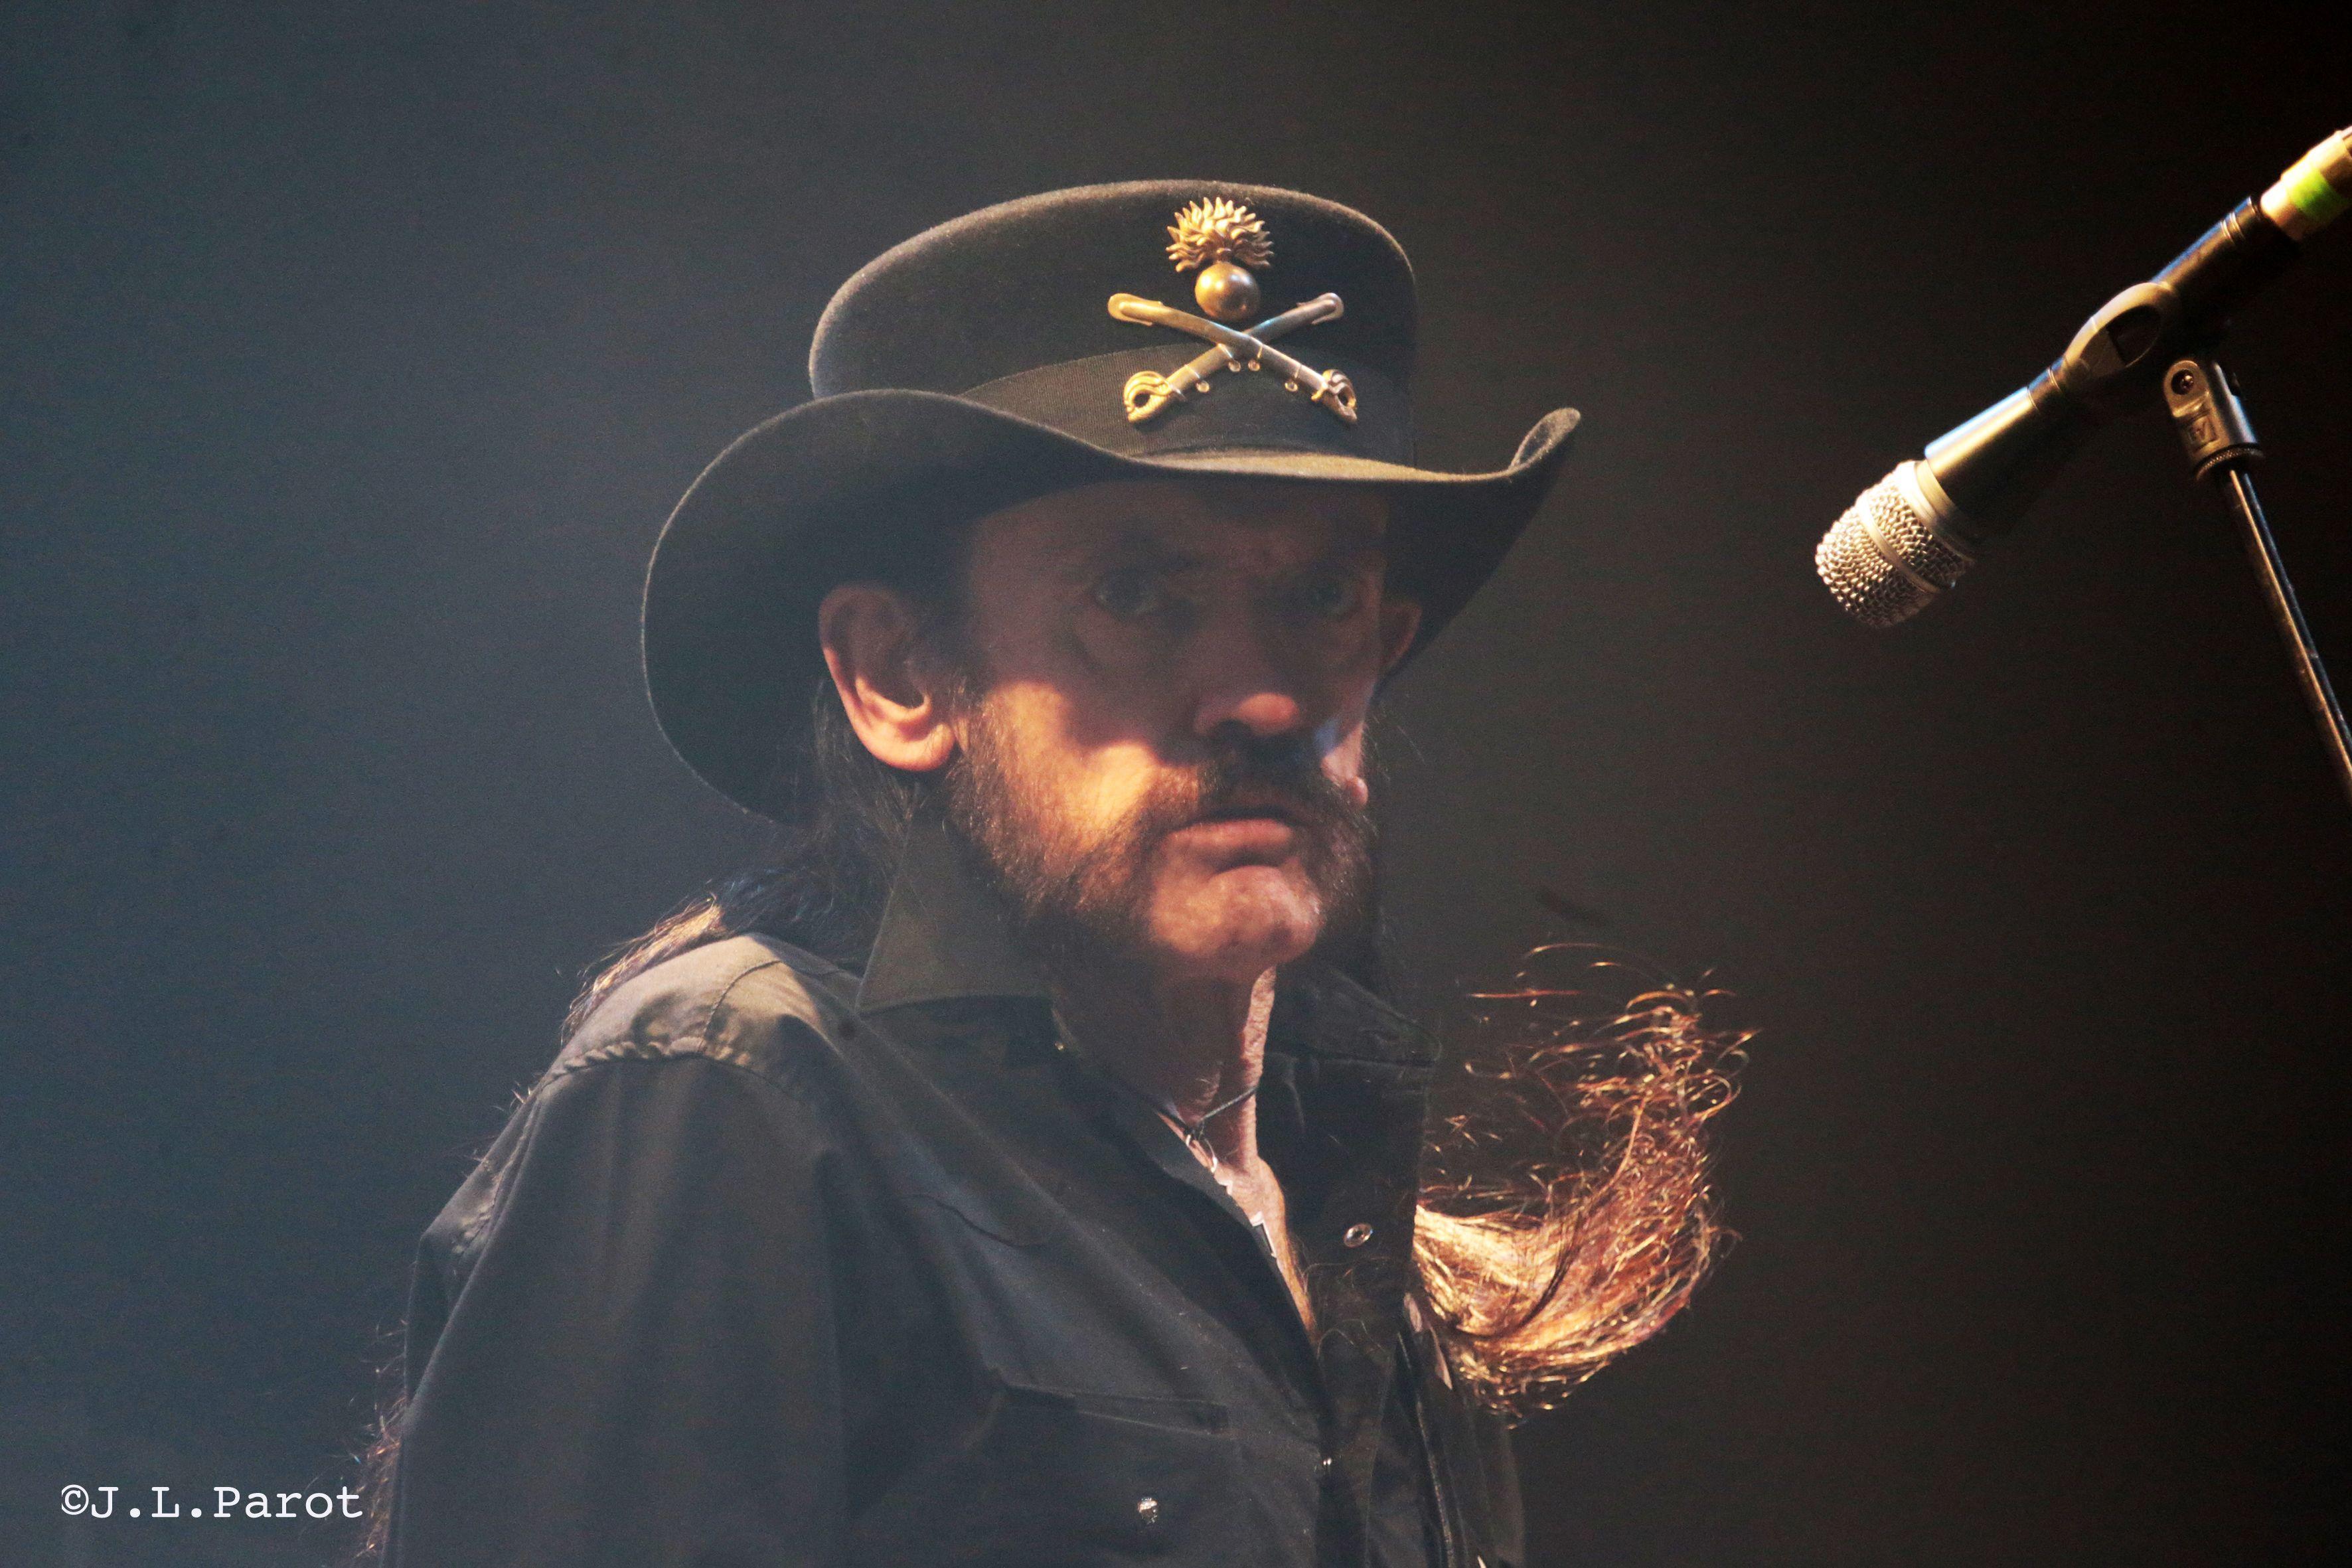 Lemmy Kilmister Rock Music Motorhead Wallpaper Hd: Lemmy Kilmister Wallpapers